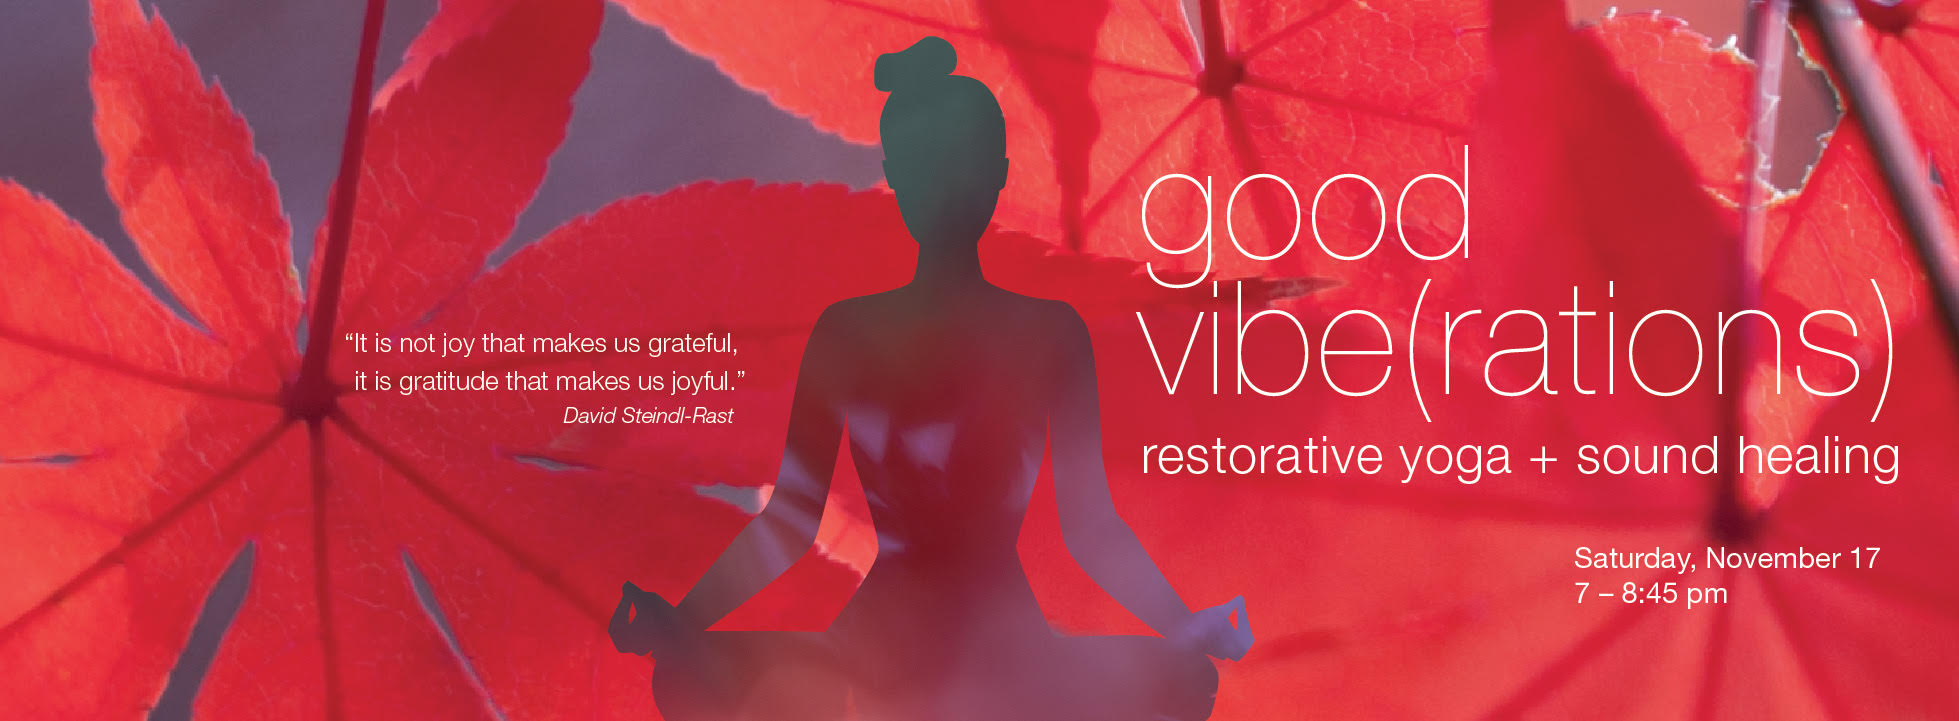 good-viberations-restorative-yoga-sound-healing